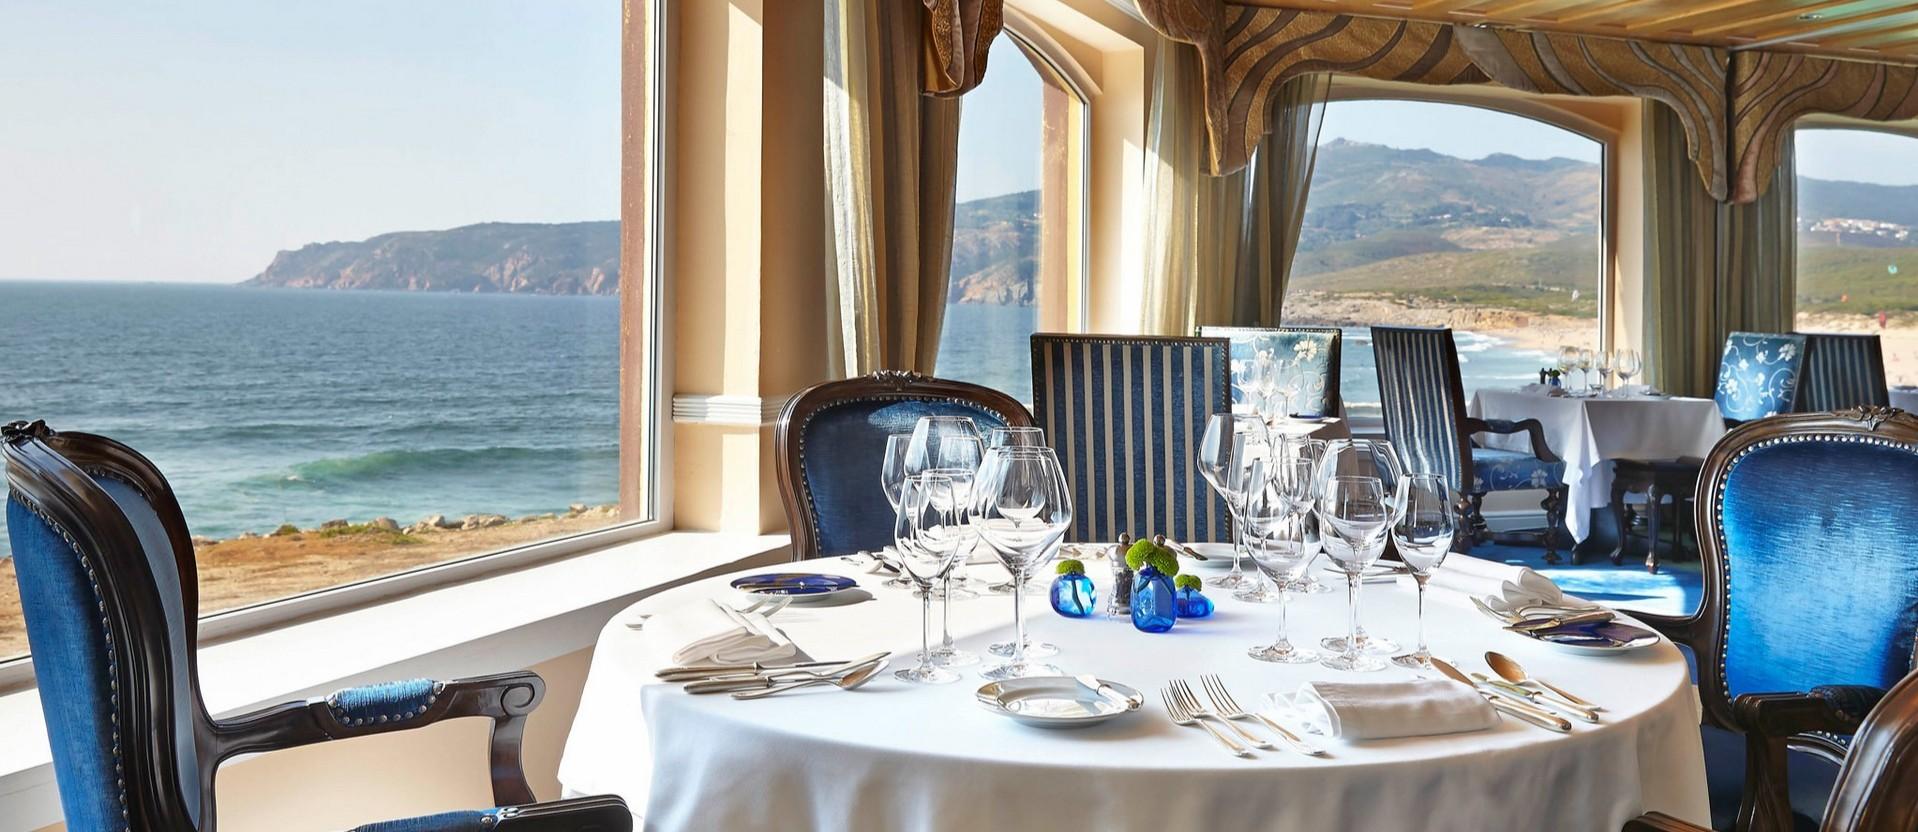 Michelin star restaurants: Fortaleza do Guincho michelin star restaurants Michelin star restaurants: The complete guide for 2019 Michelin star restaurants 4